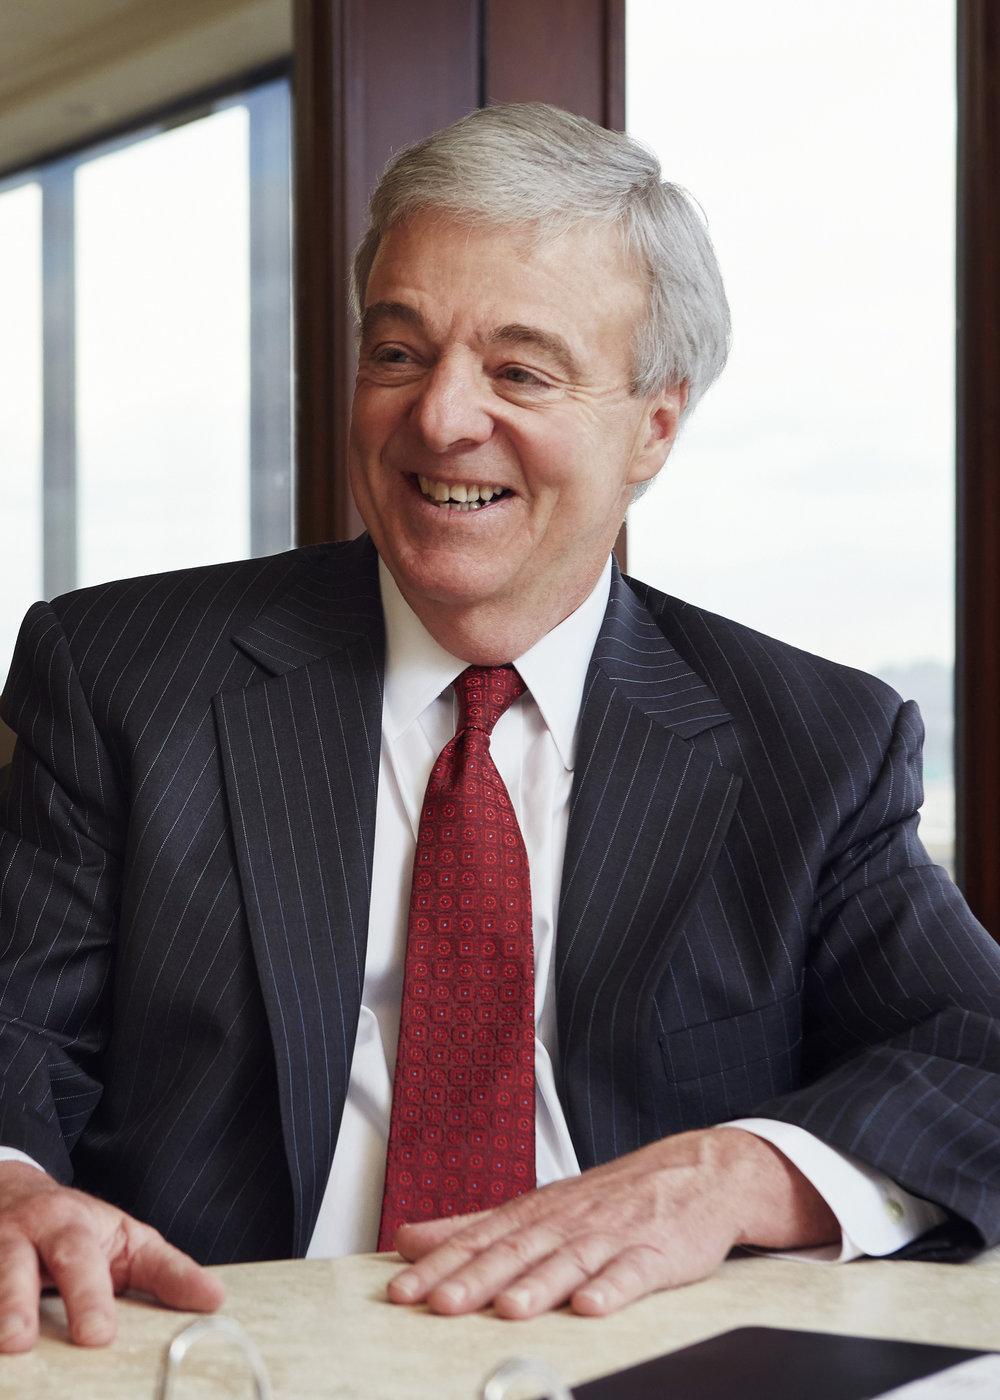 Jay Waller, Birmingham. Jonathan Waller Birmingham Attorney At Law. Jay Waller Law